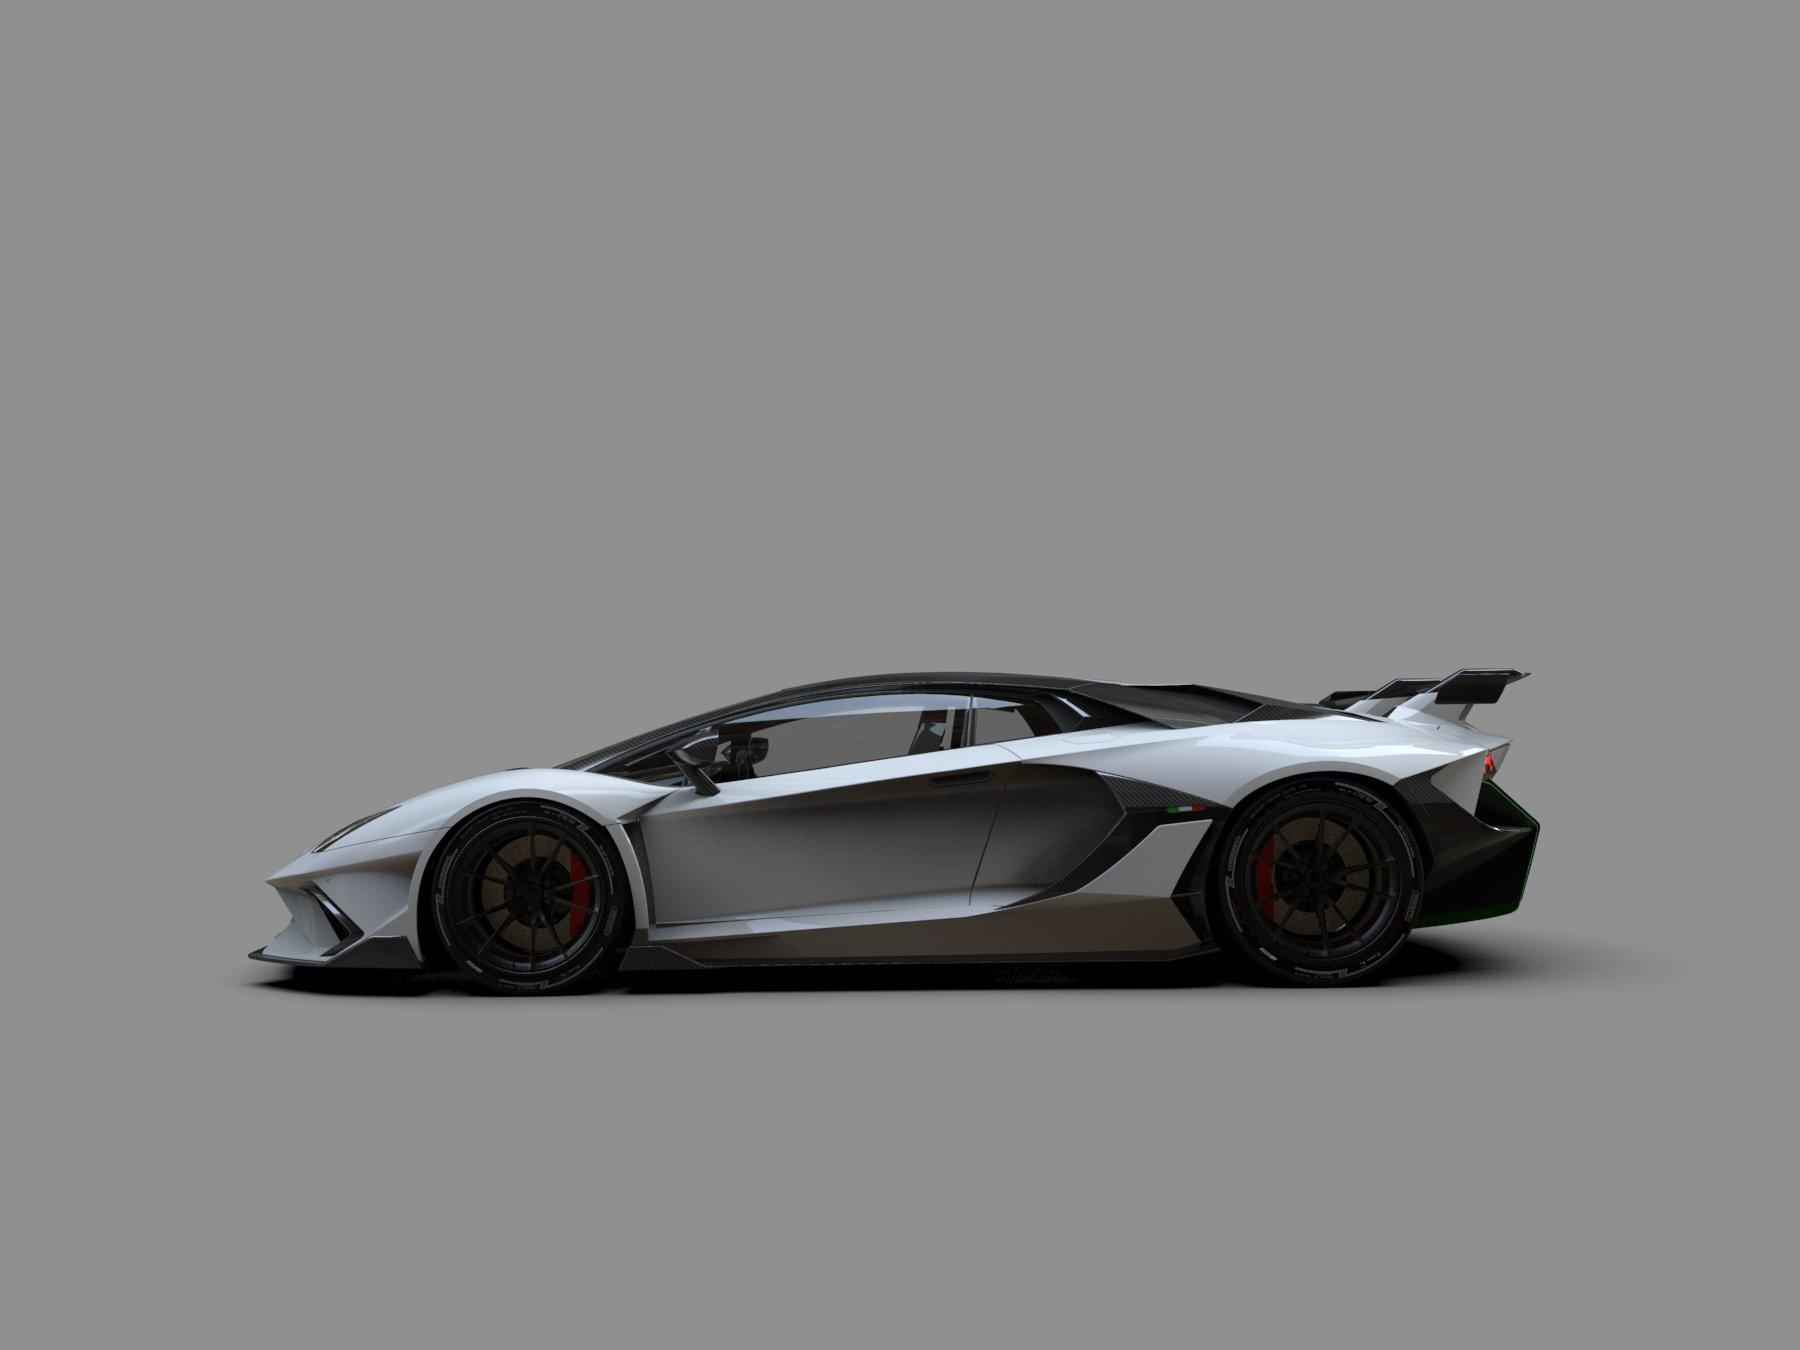 Lamborghini_Aventador_by_Duke_Dynamics_0016